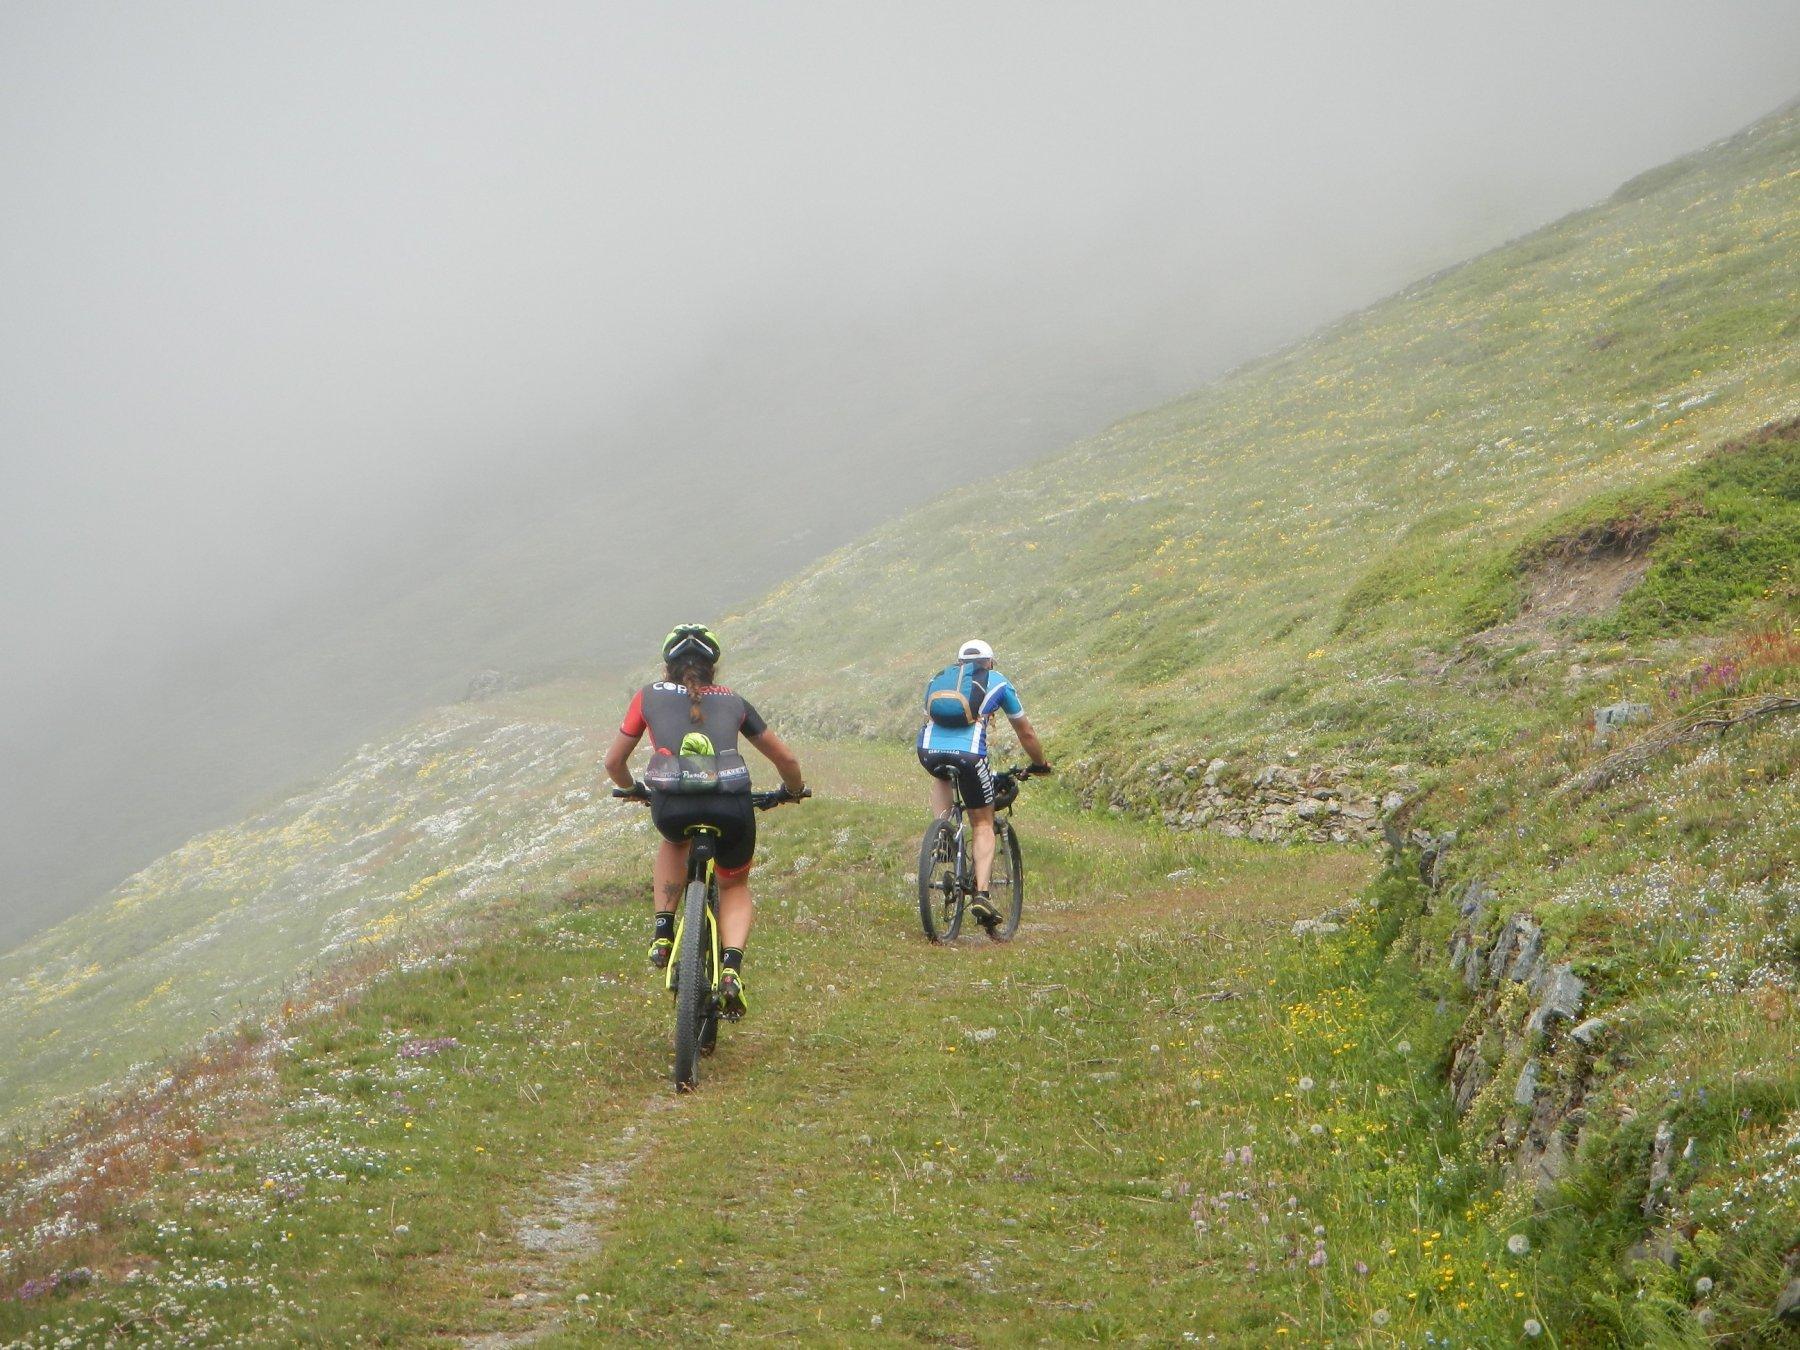 il bel sentiero di salita sul versante sud del Monte Pintas